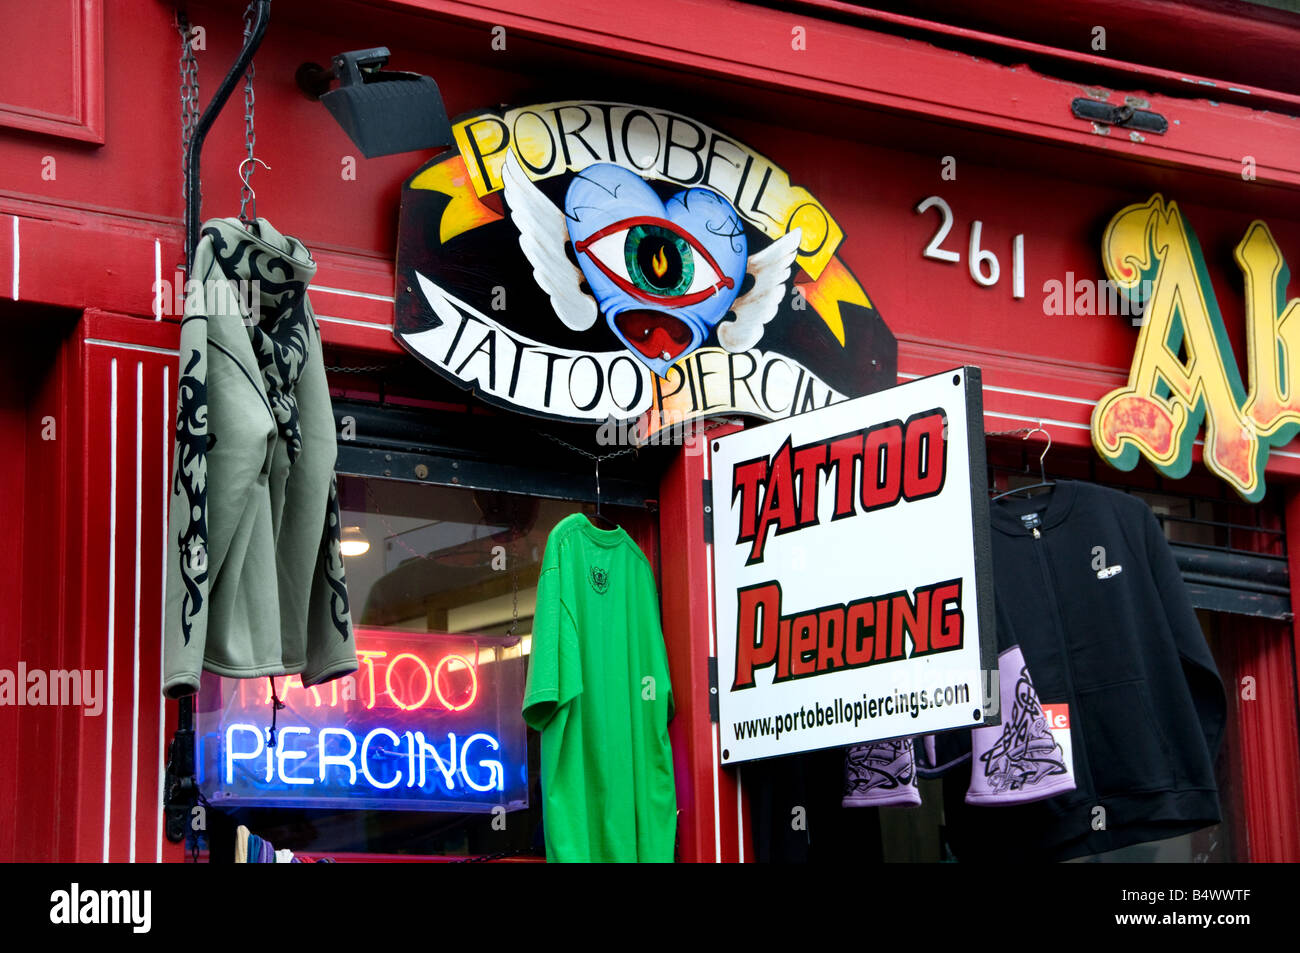 Portobello Road Market Notting Hill London Piercing Tathoo - Stock Image